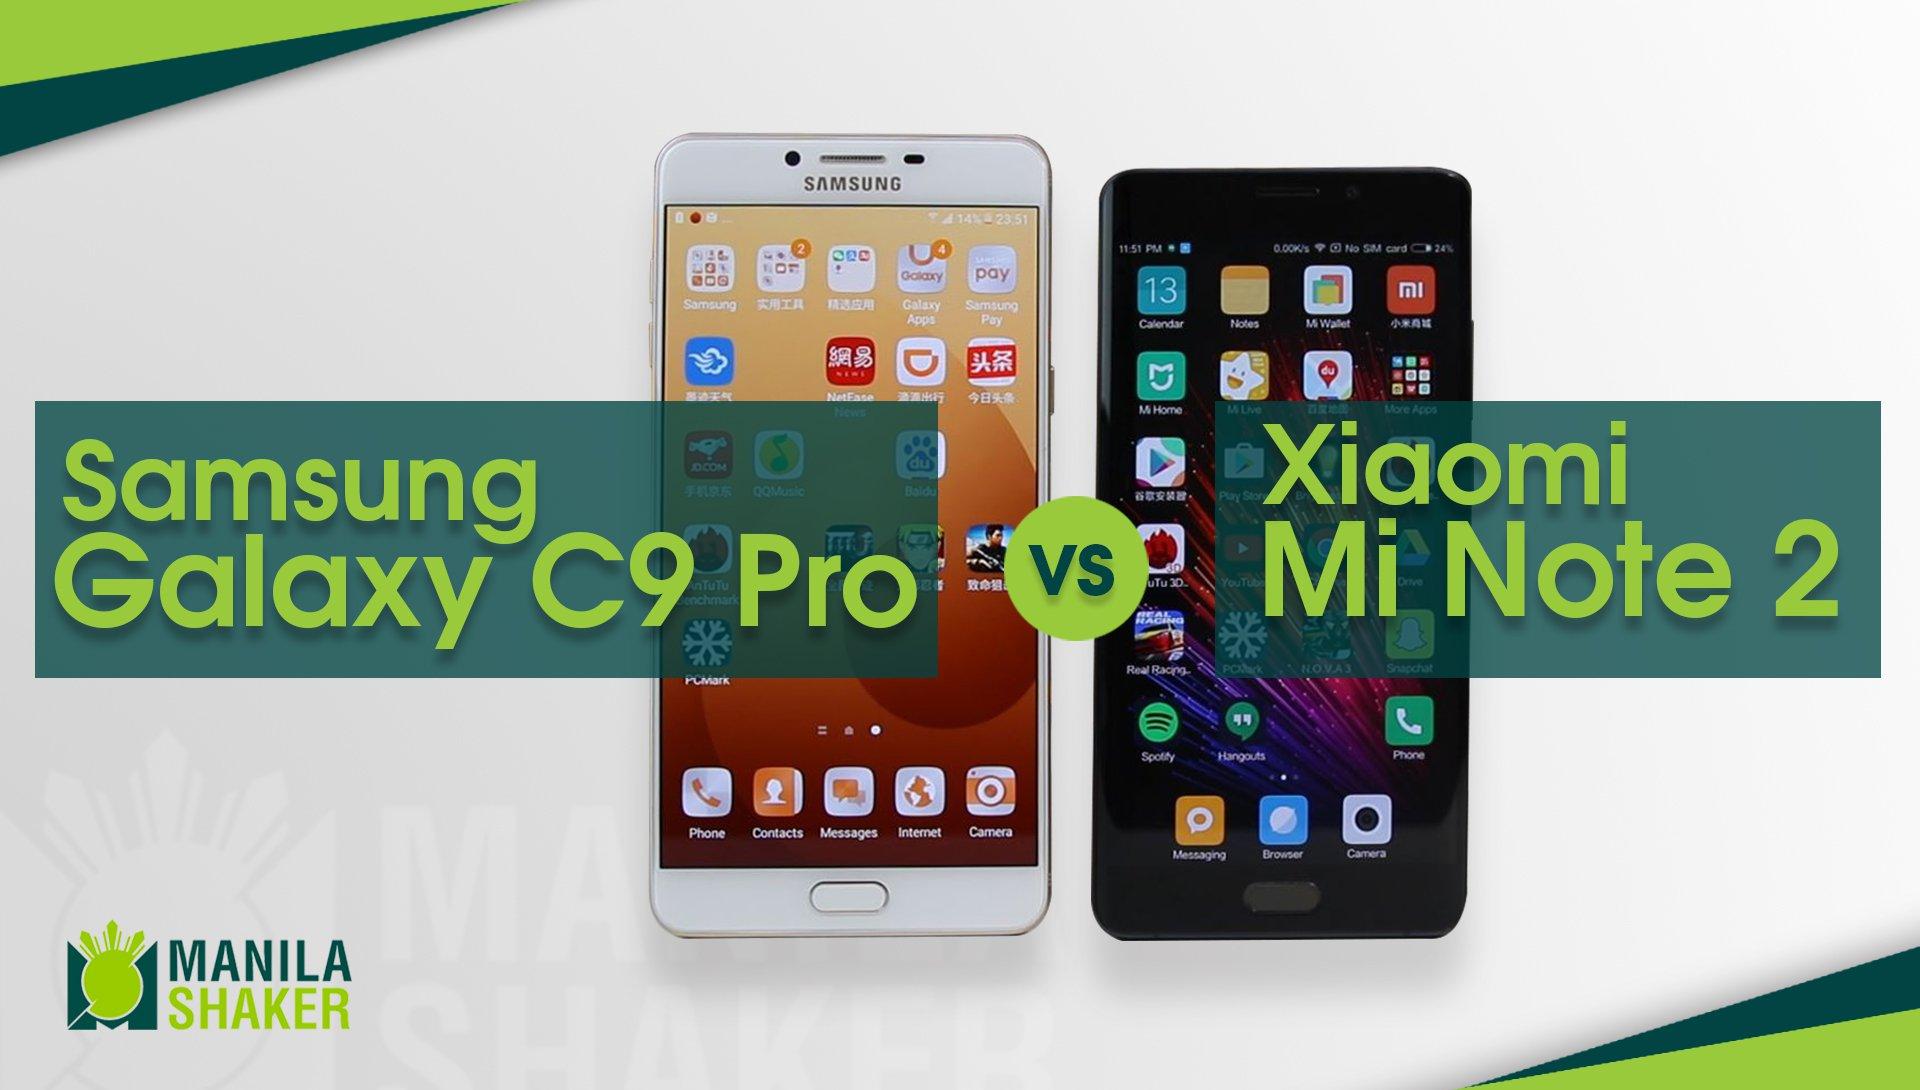 phone-off-xiaomi-mi-note-2-vs-samsung-galaxy-c9-pro